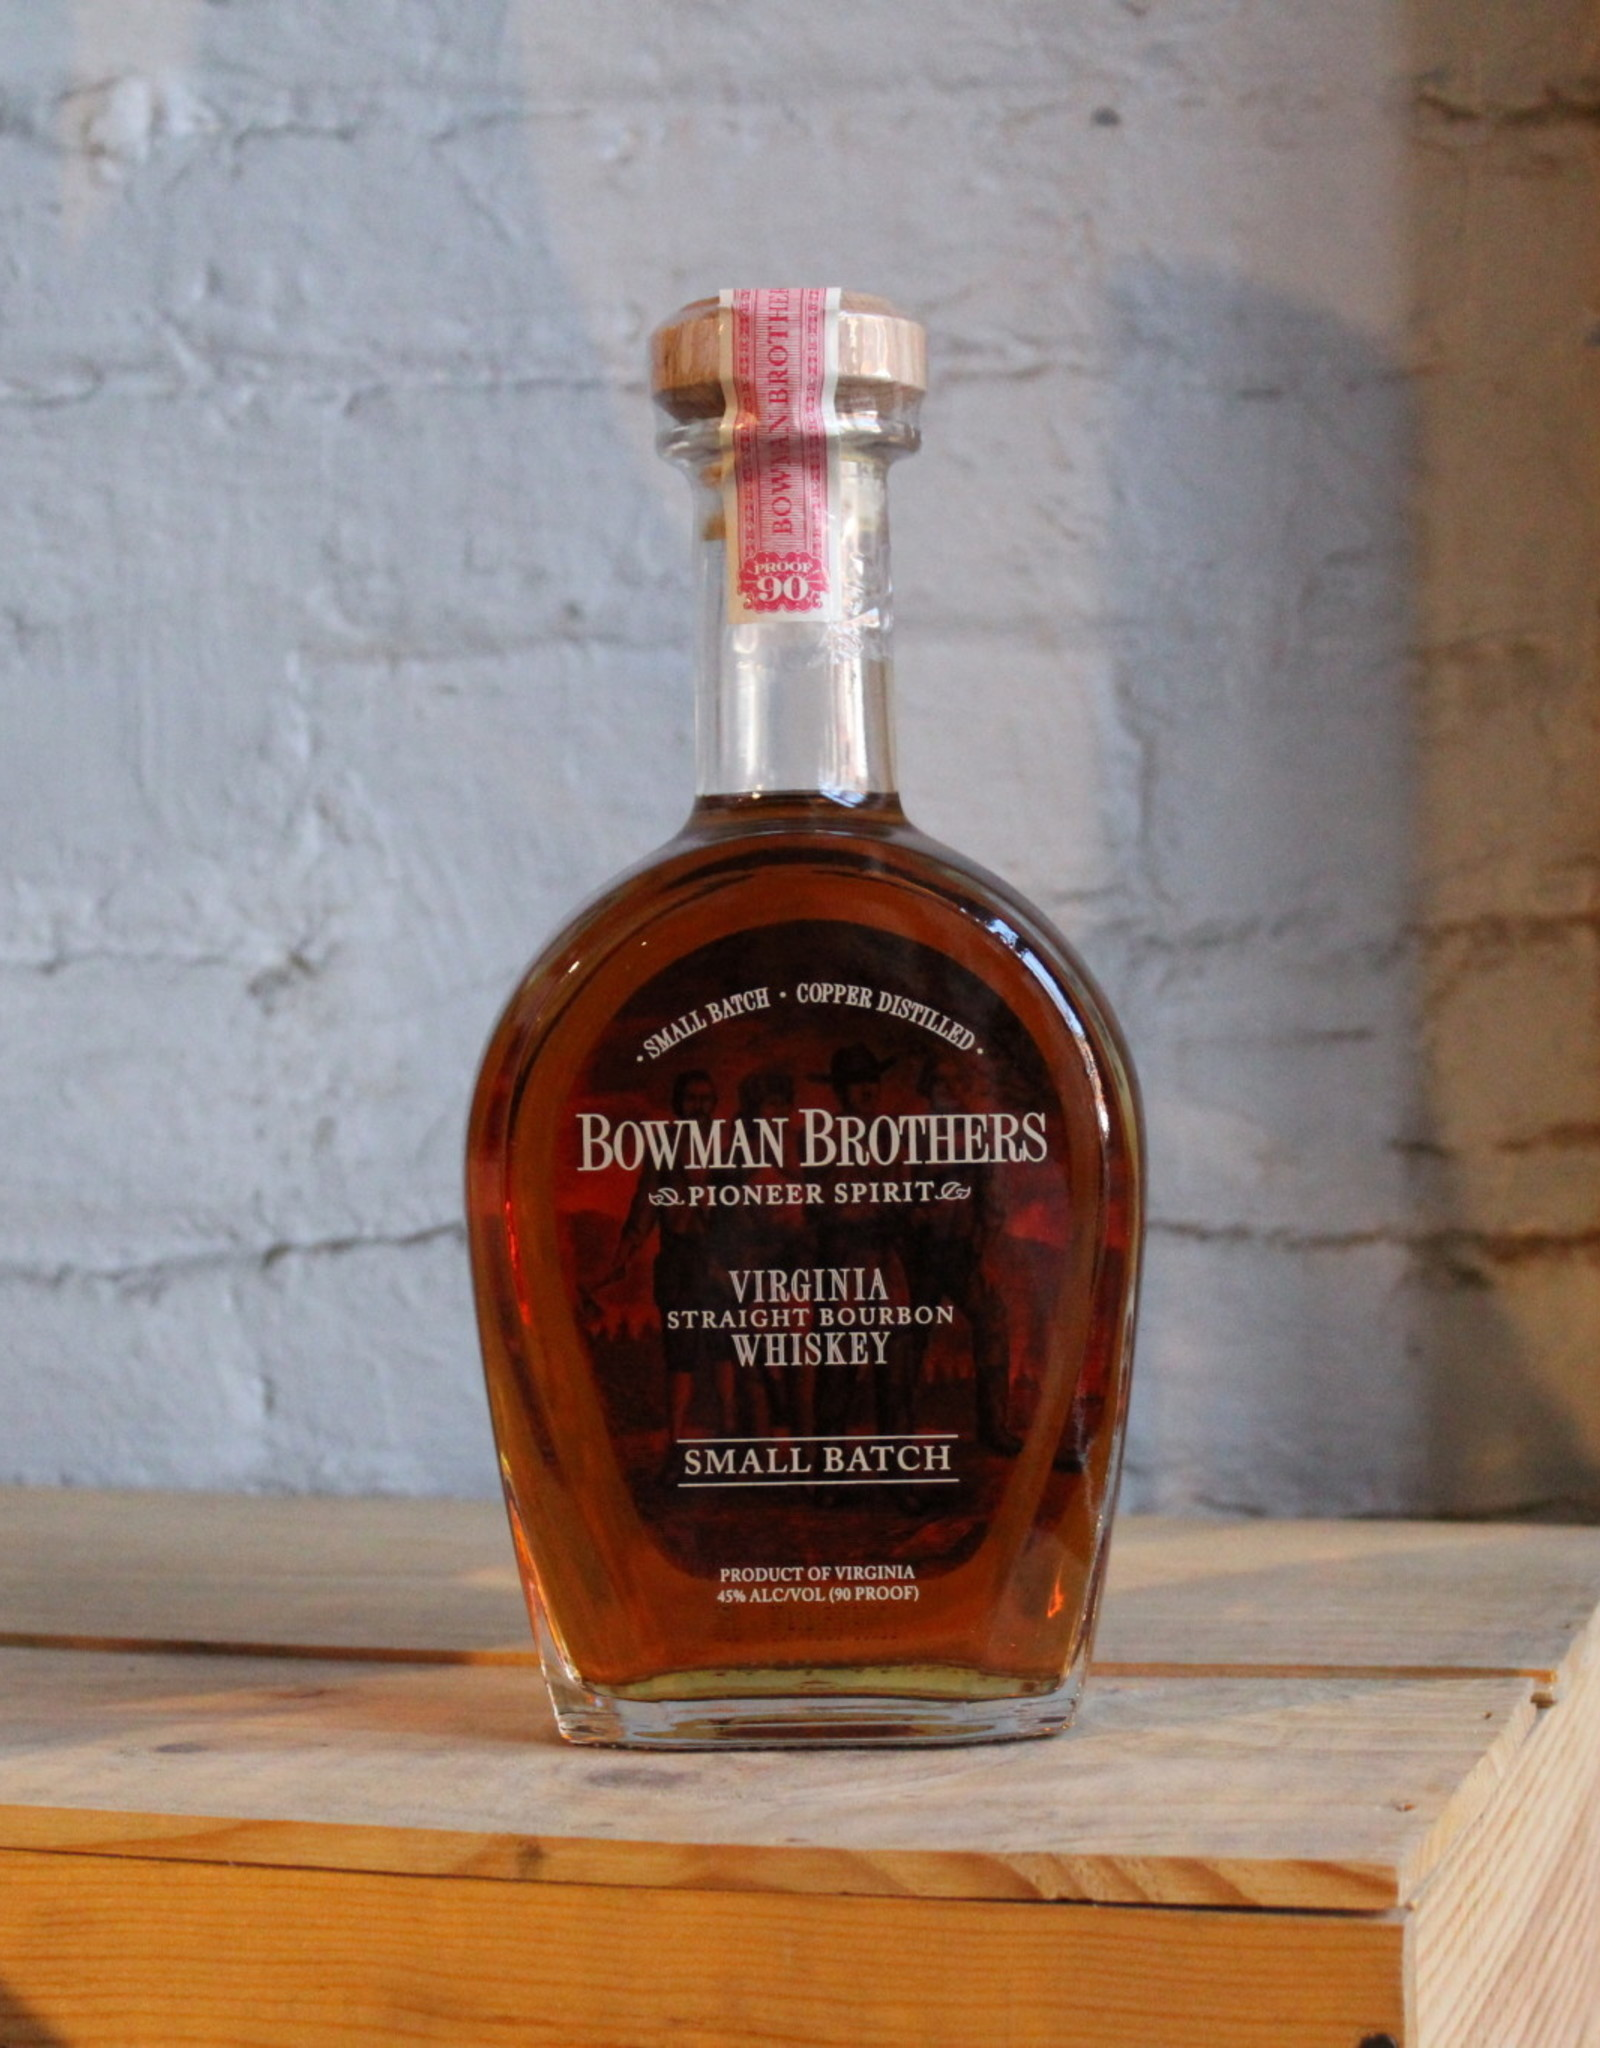 Bowman Brothers Pioneer Spirit Small Batch Straight Bourbon Whiskey - Virginia (750ml)